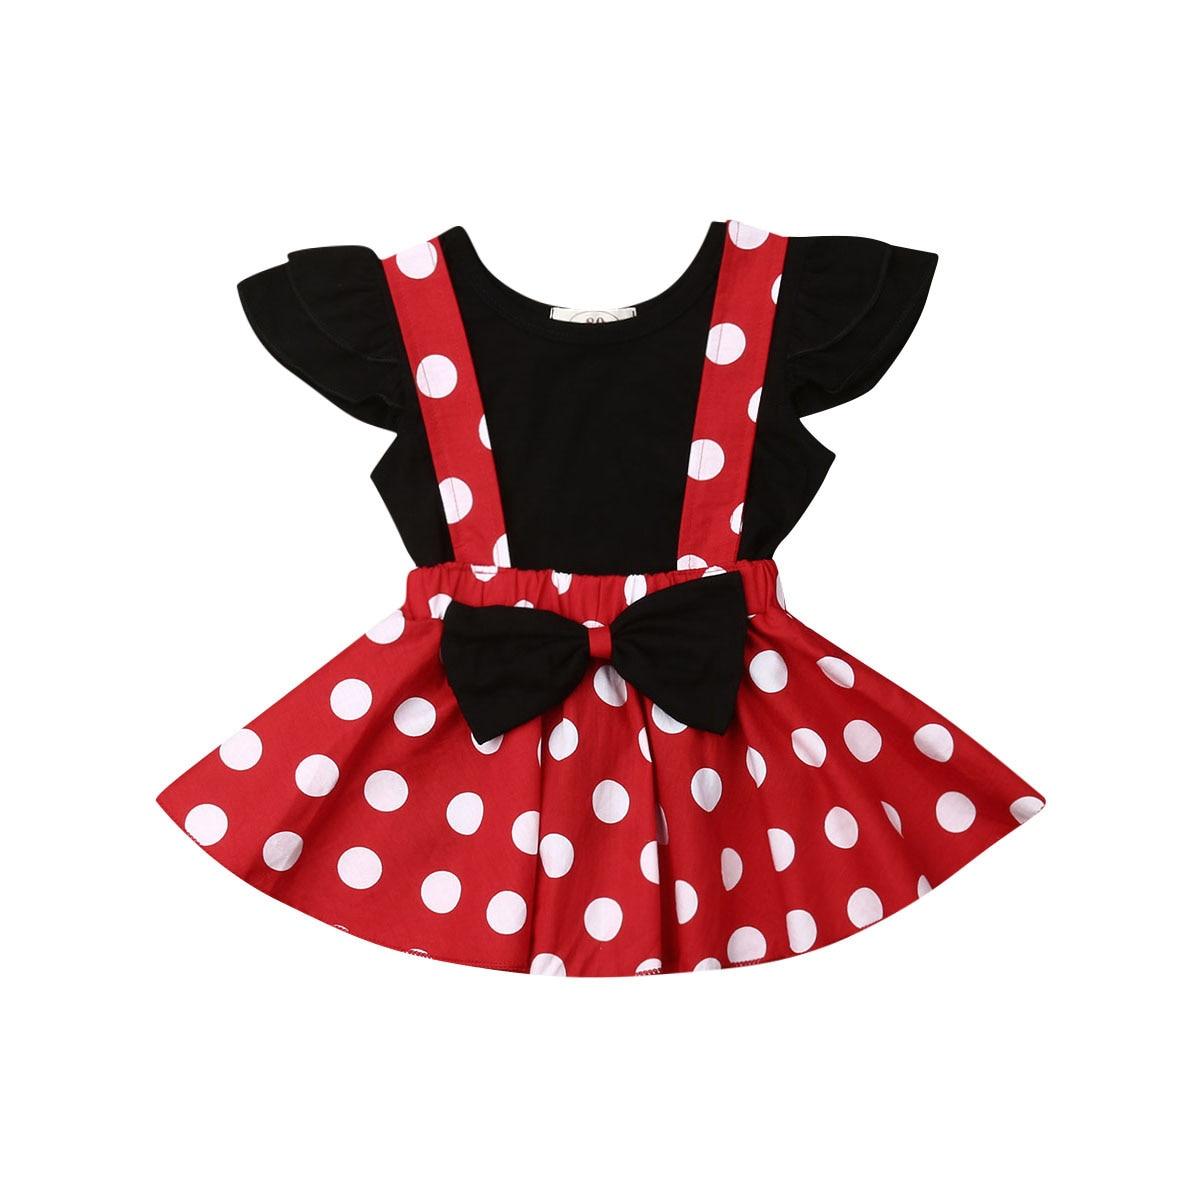 2PCS Set Kleinkind Kinder Baby Mädchen Fliegen Hülse Schwarz T-shirt Tops Dot Bogen Hosenträger Kleid Outfits Prinzessin Mädchen Kleidung